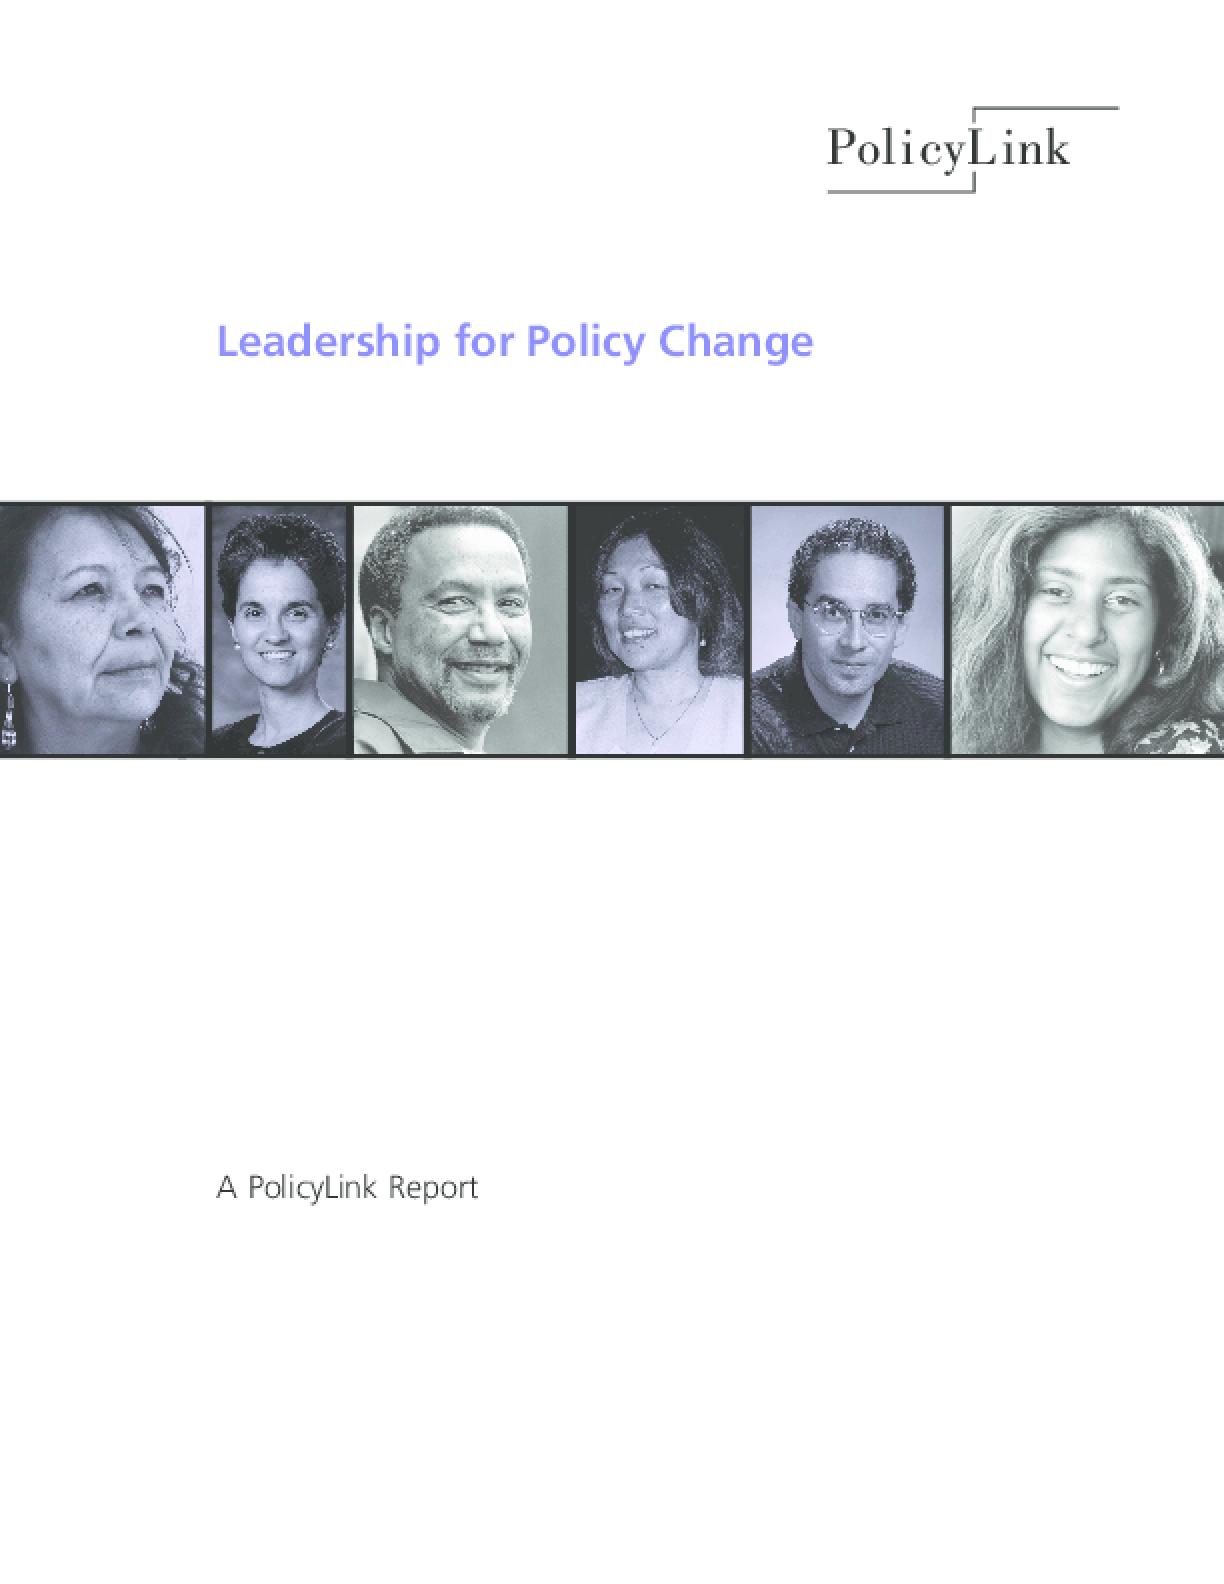 Thumbnail image ofLeadership for Policy Change